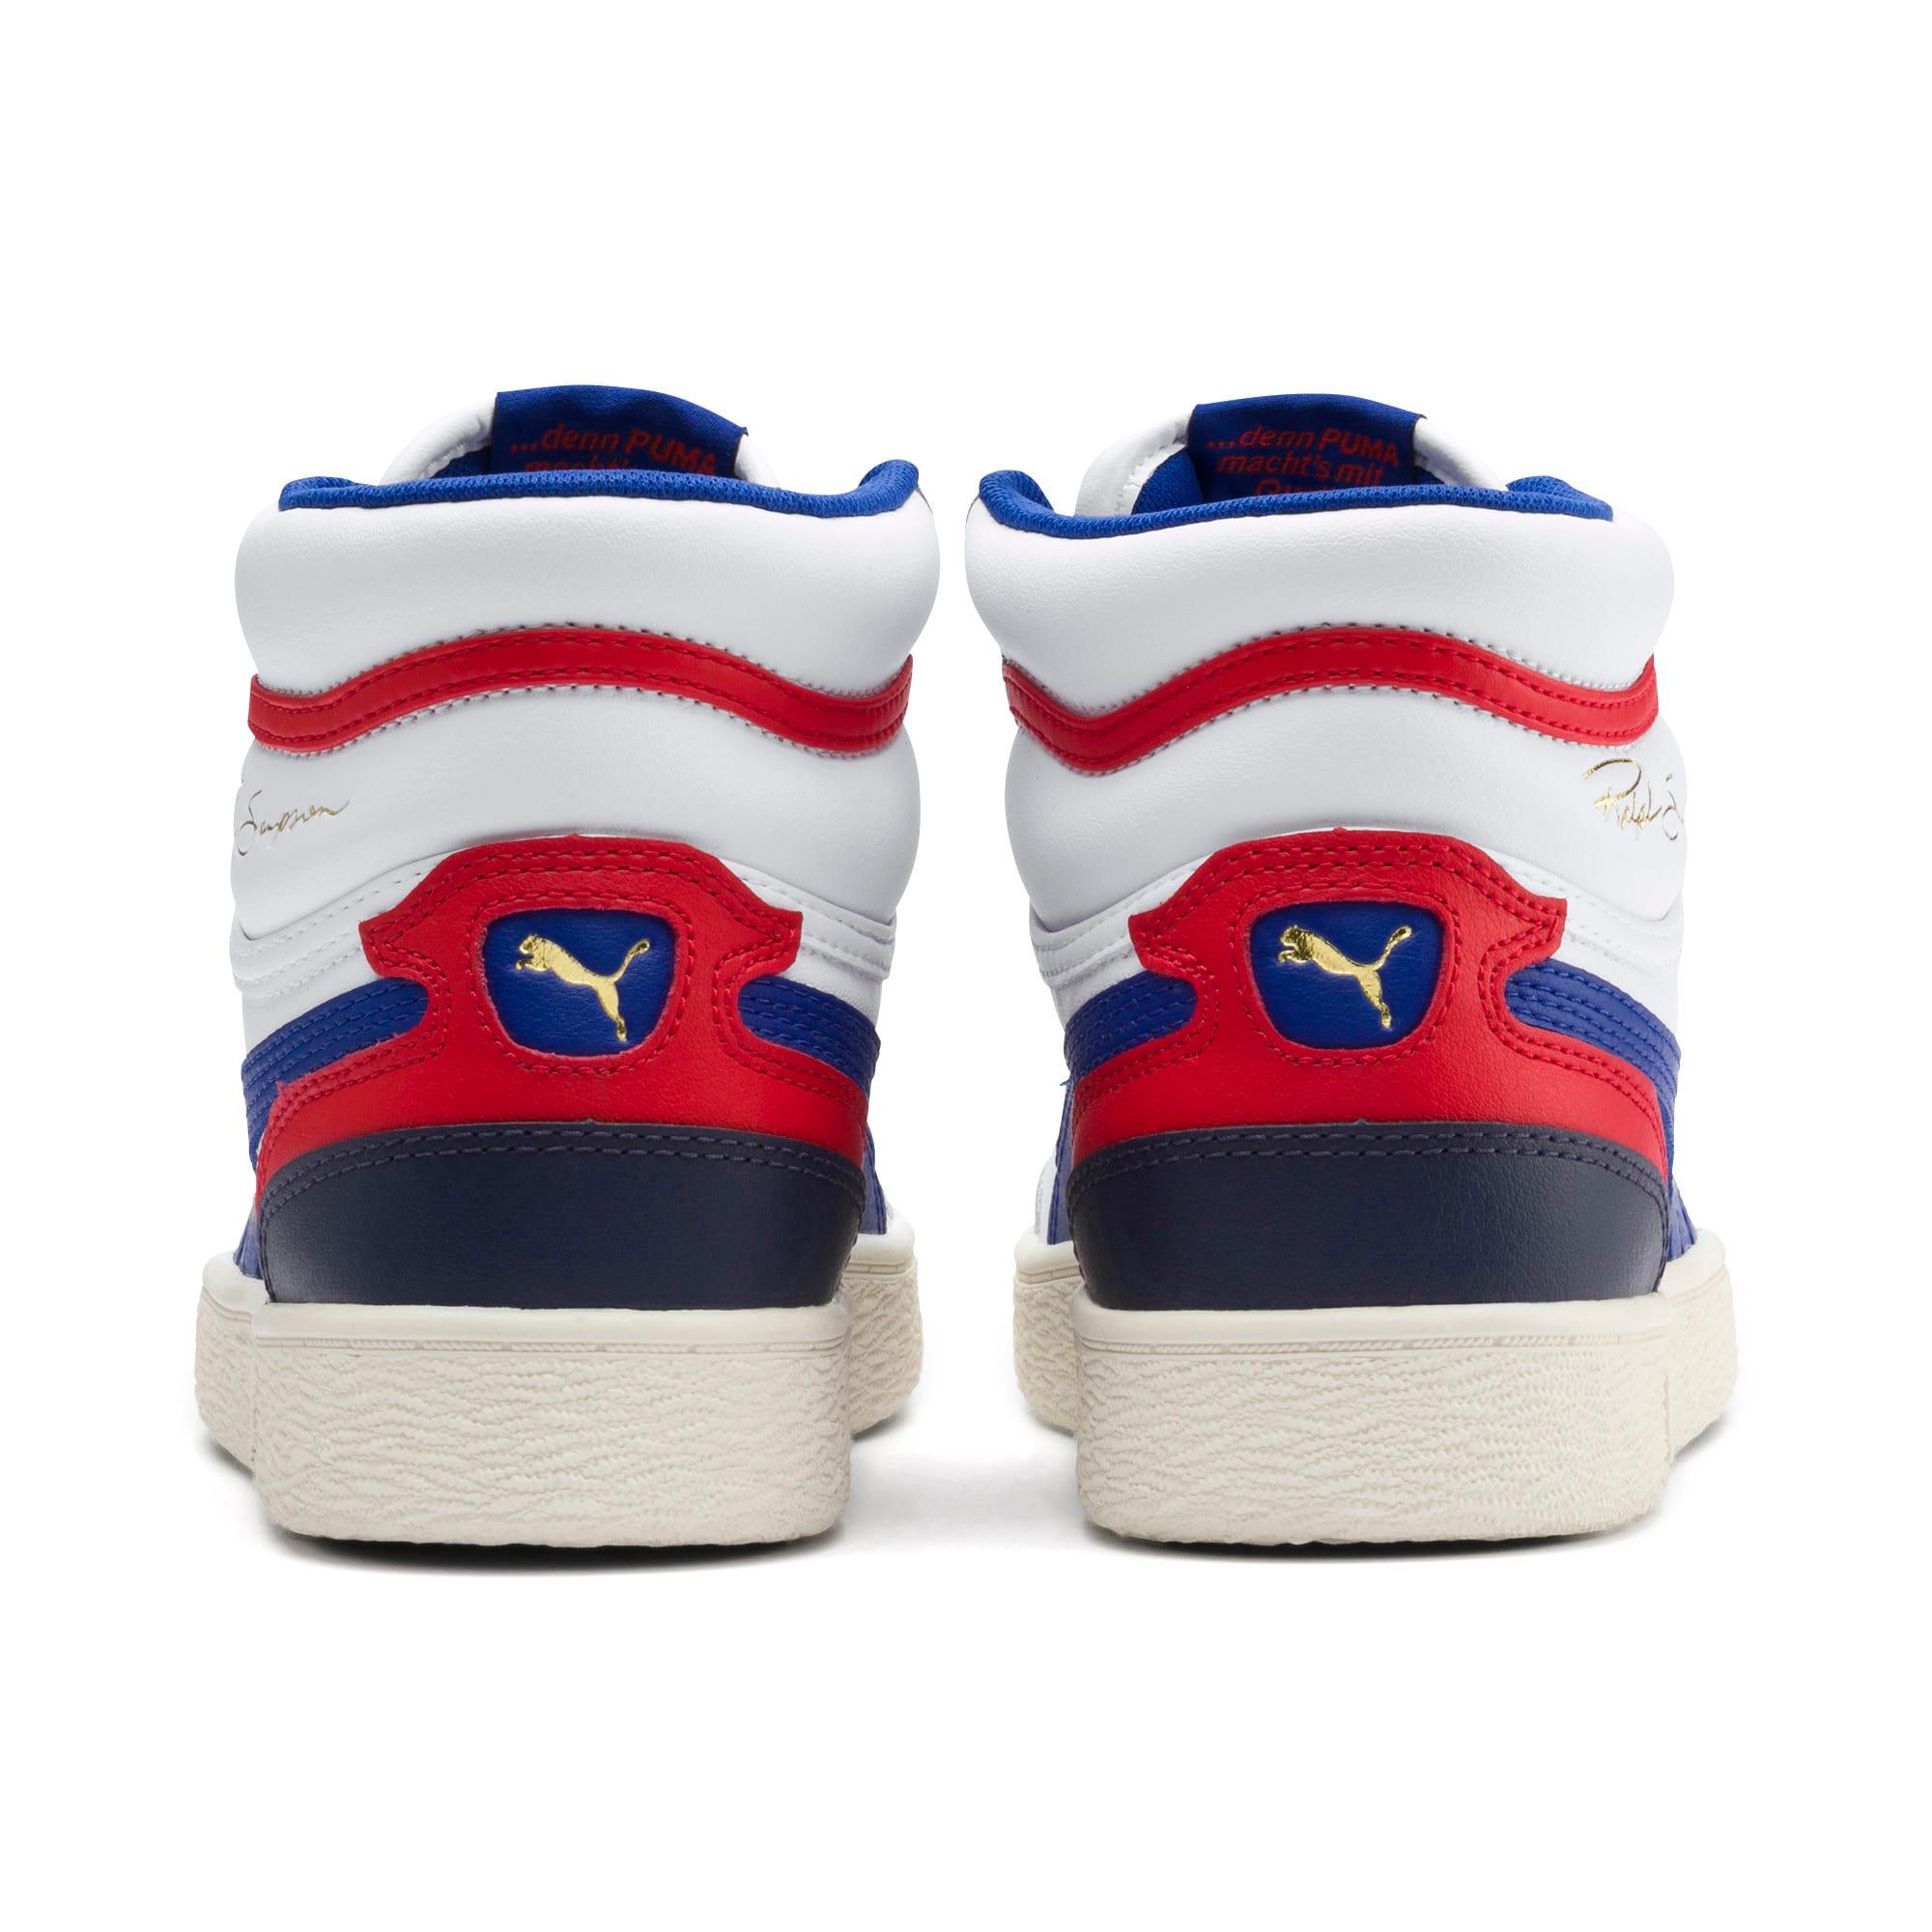 Thumbnail 3 of Ralph Sampson Mid Sneakers JR, White-SurfTheWeb-Marshmallow, medium